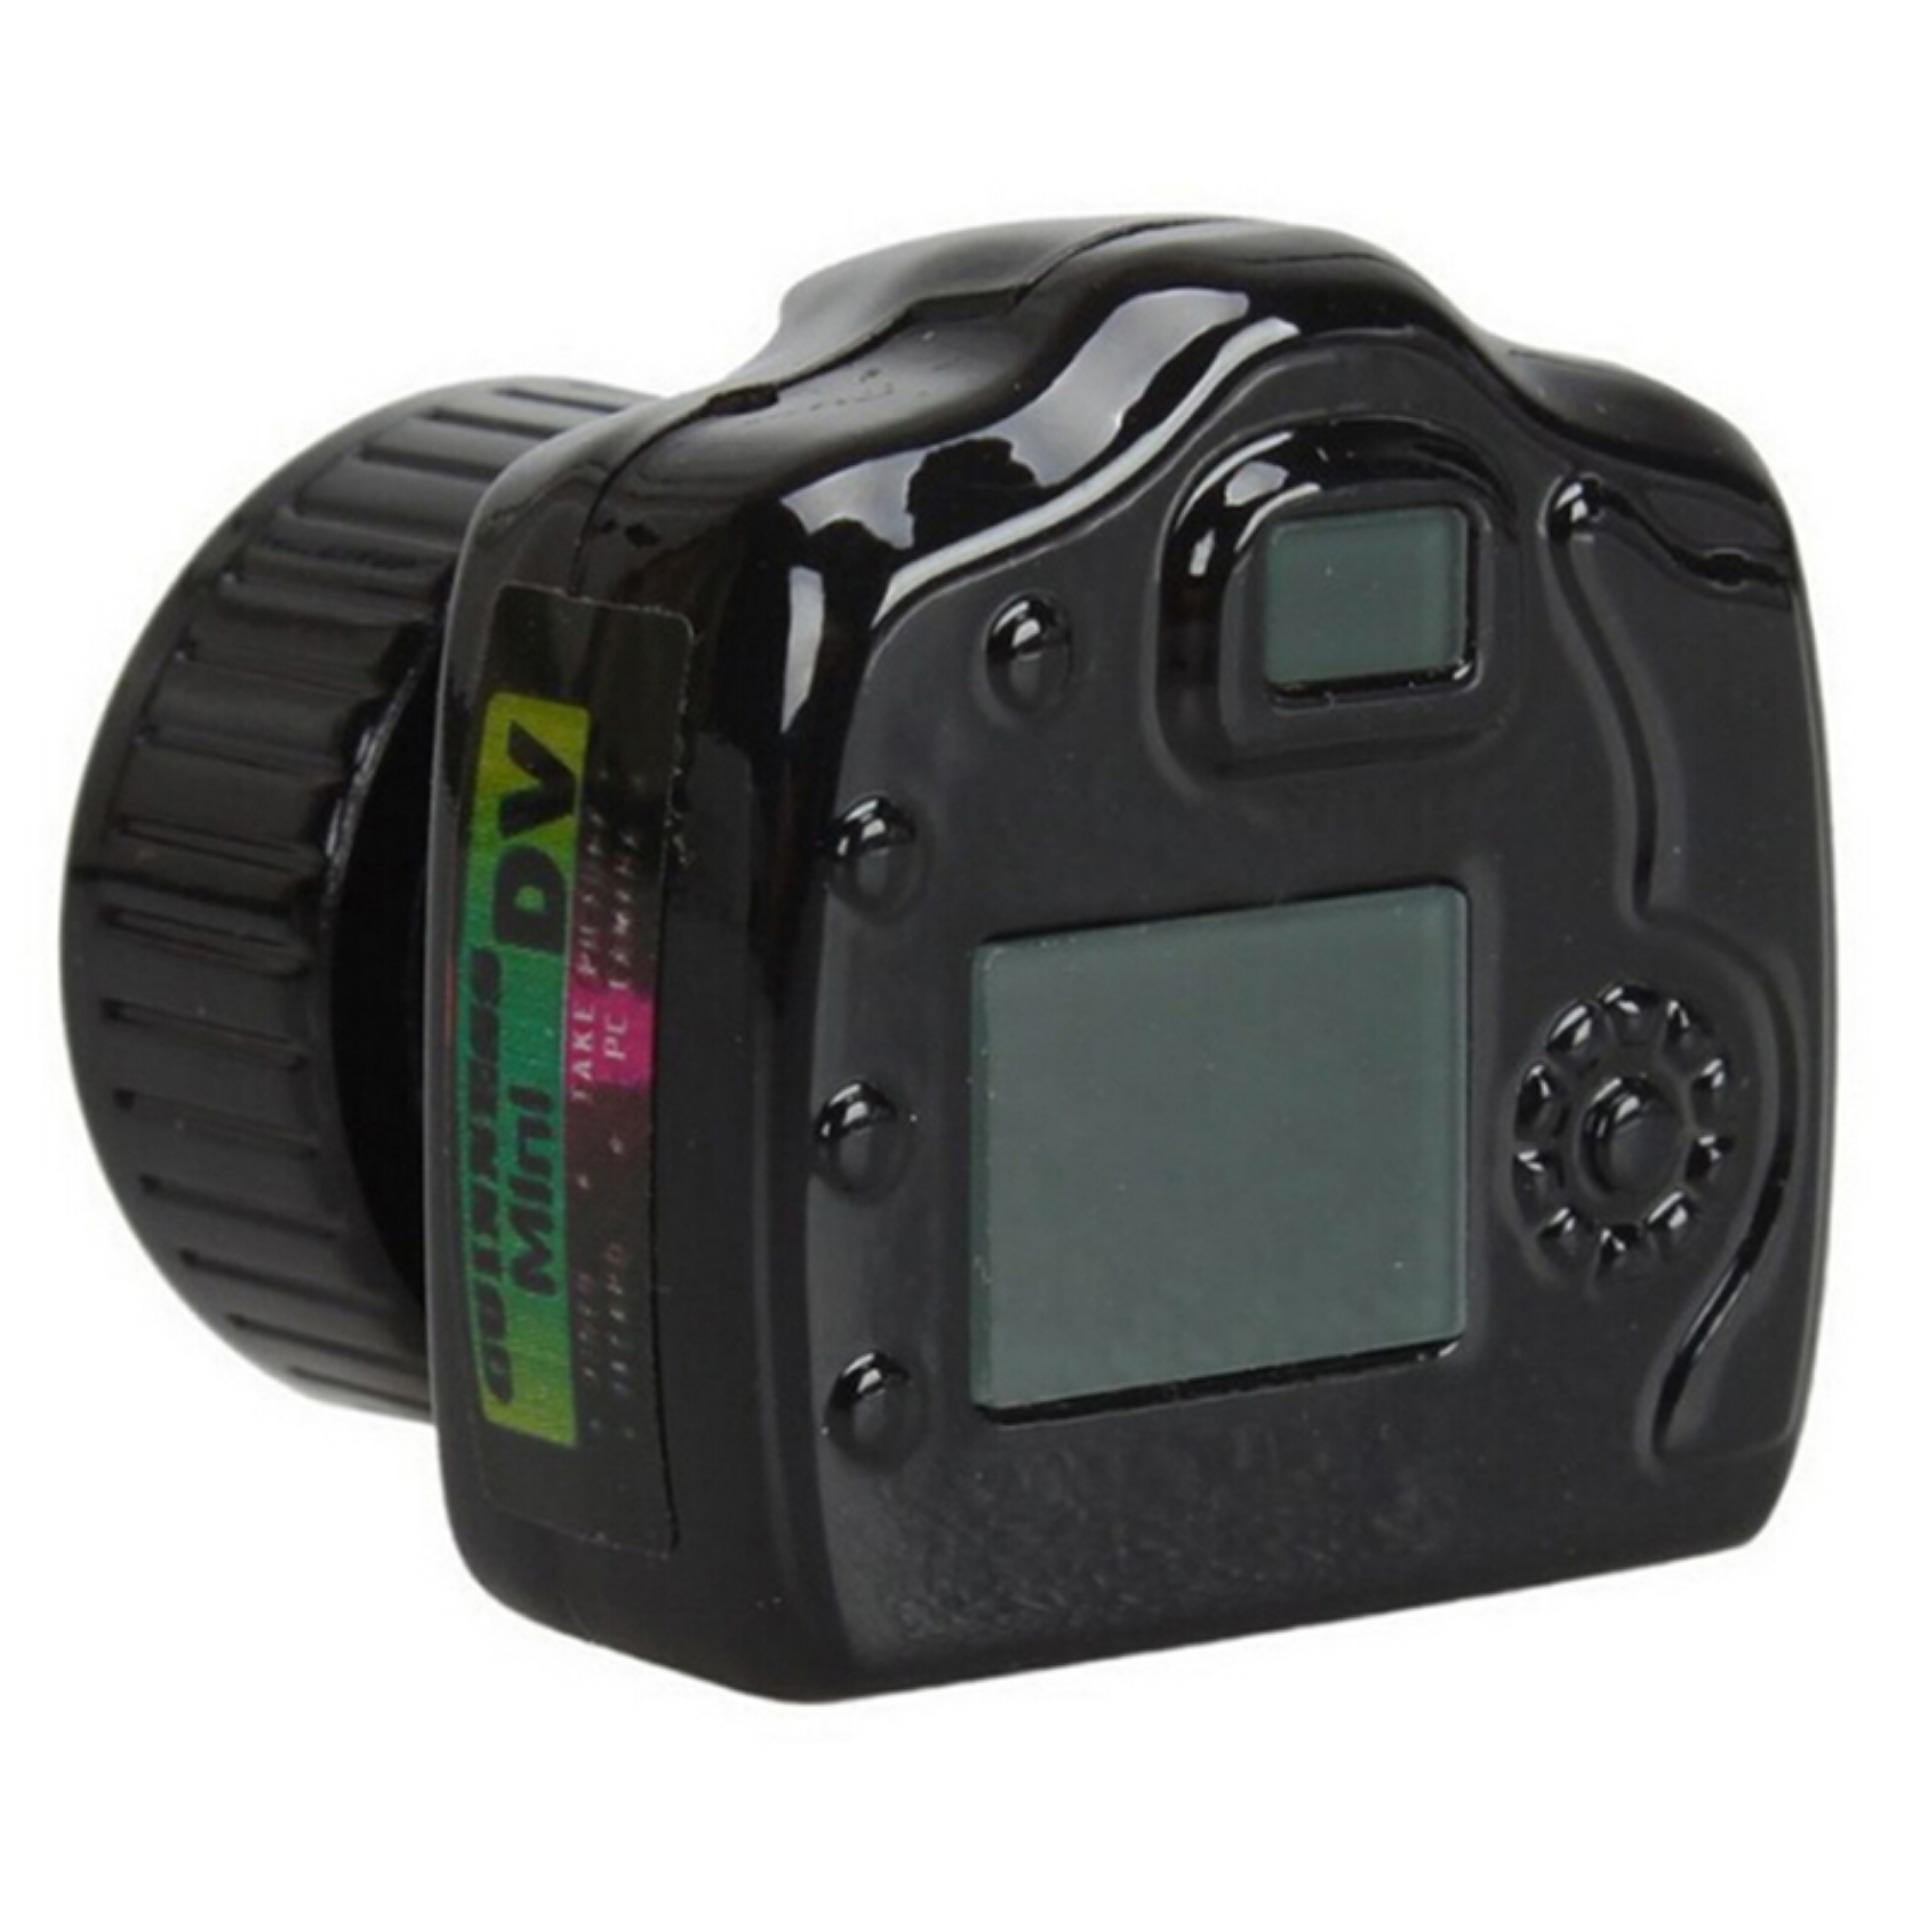 ... HengSong 2MP HD Mini DV Digital Camera Video Recorder CamcorderWebcam DVR Spy Outdoor Recorder(Black ...